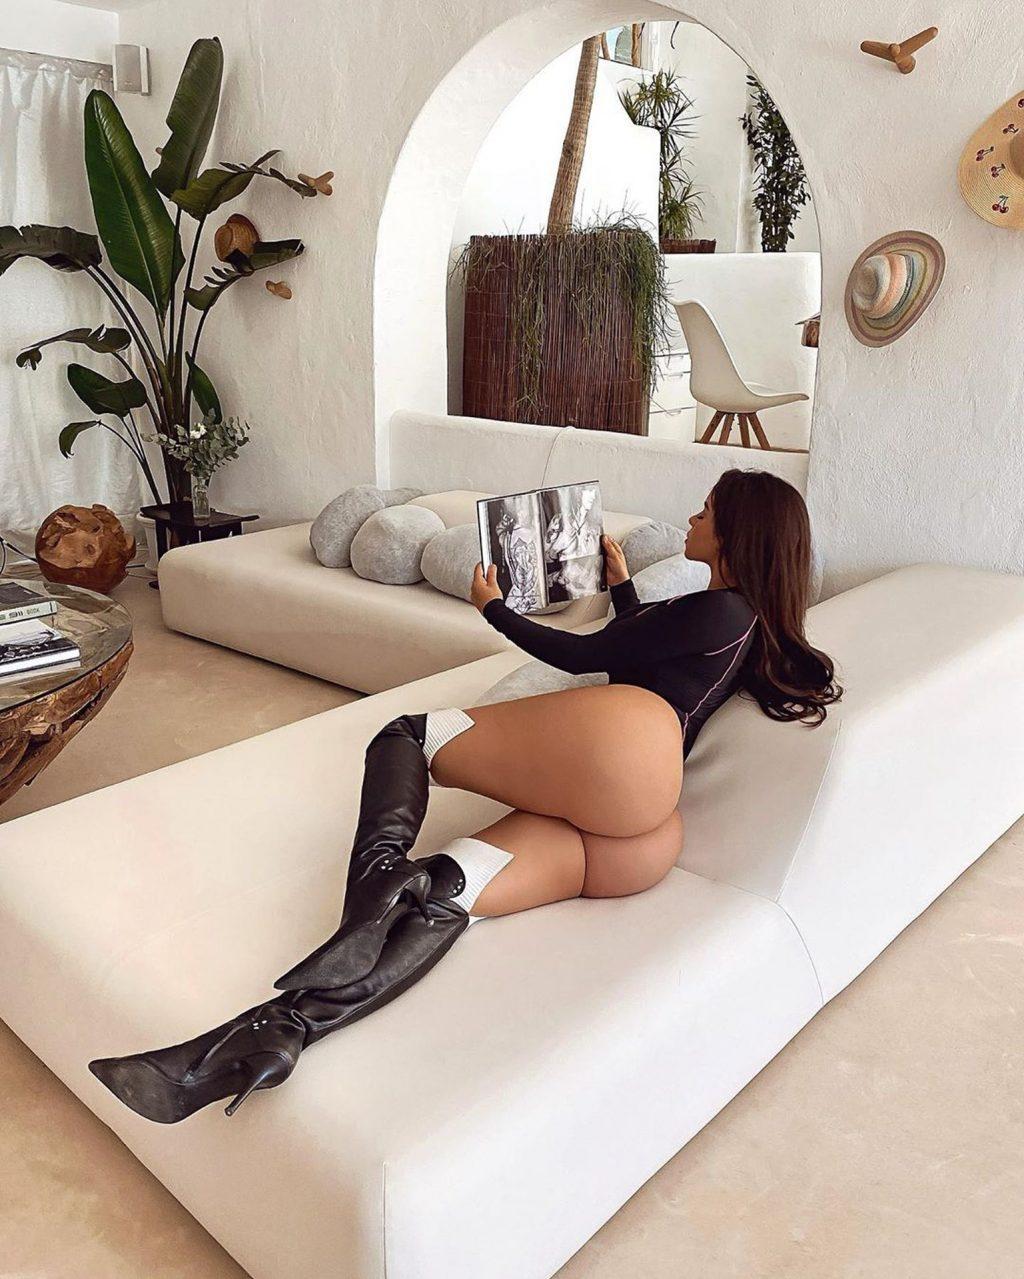 Demi Rose Enjoys a Night Out in Ibiza (21 Photos)